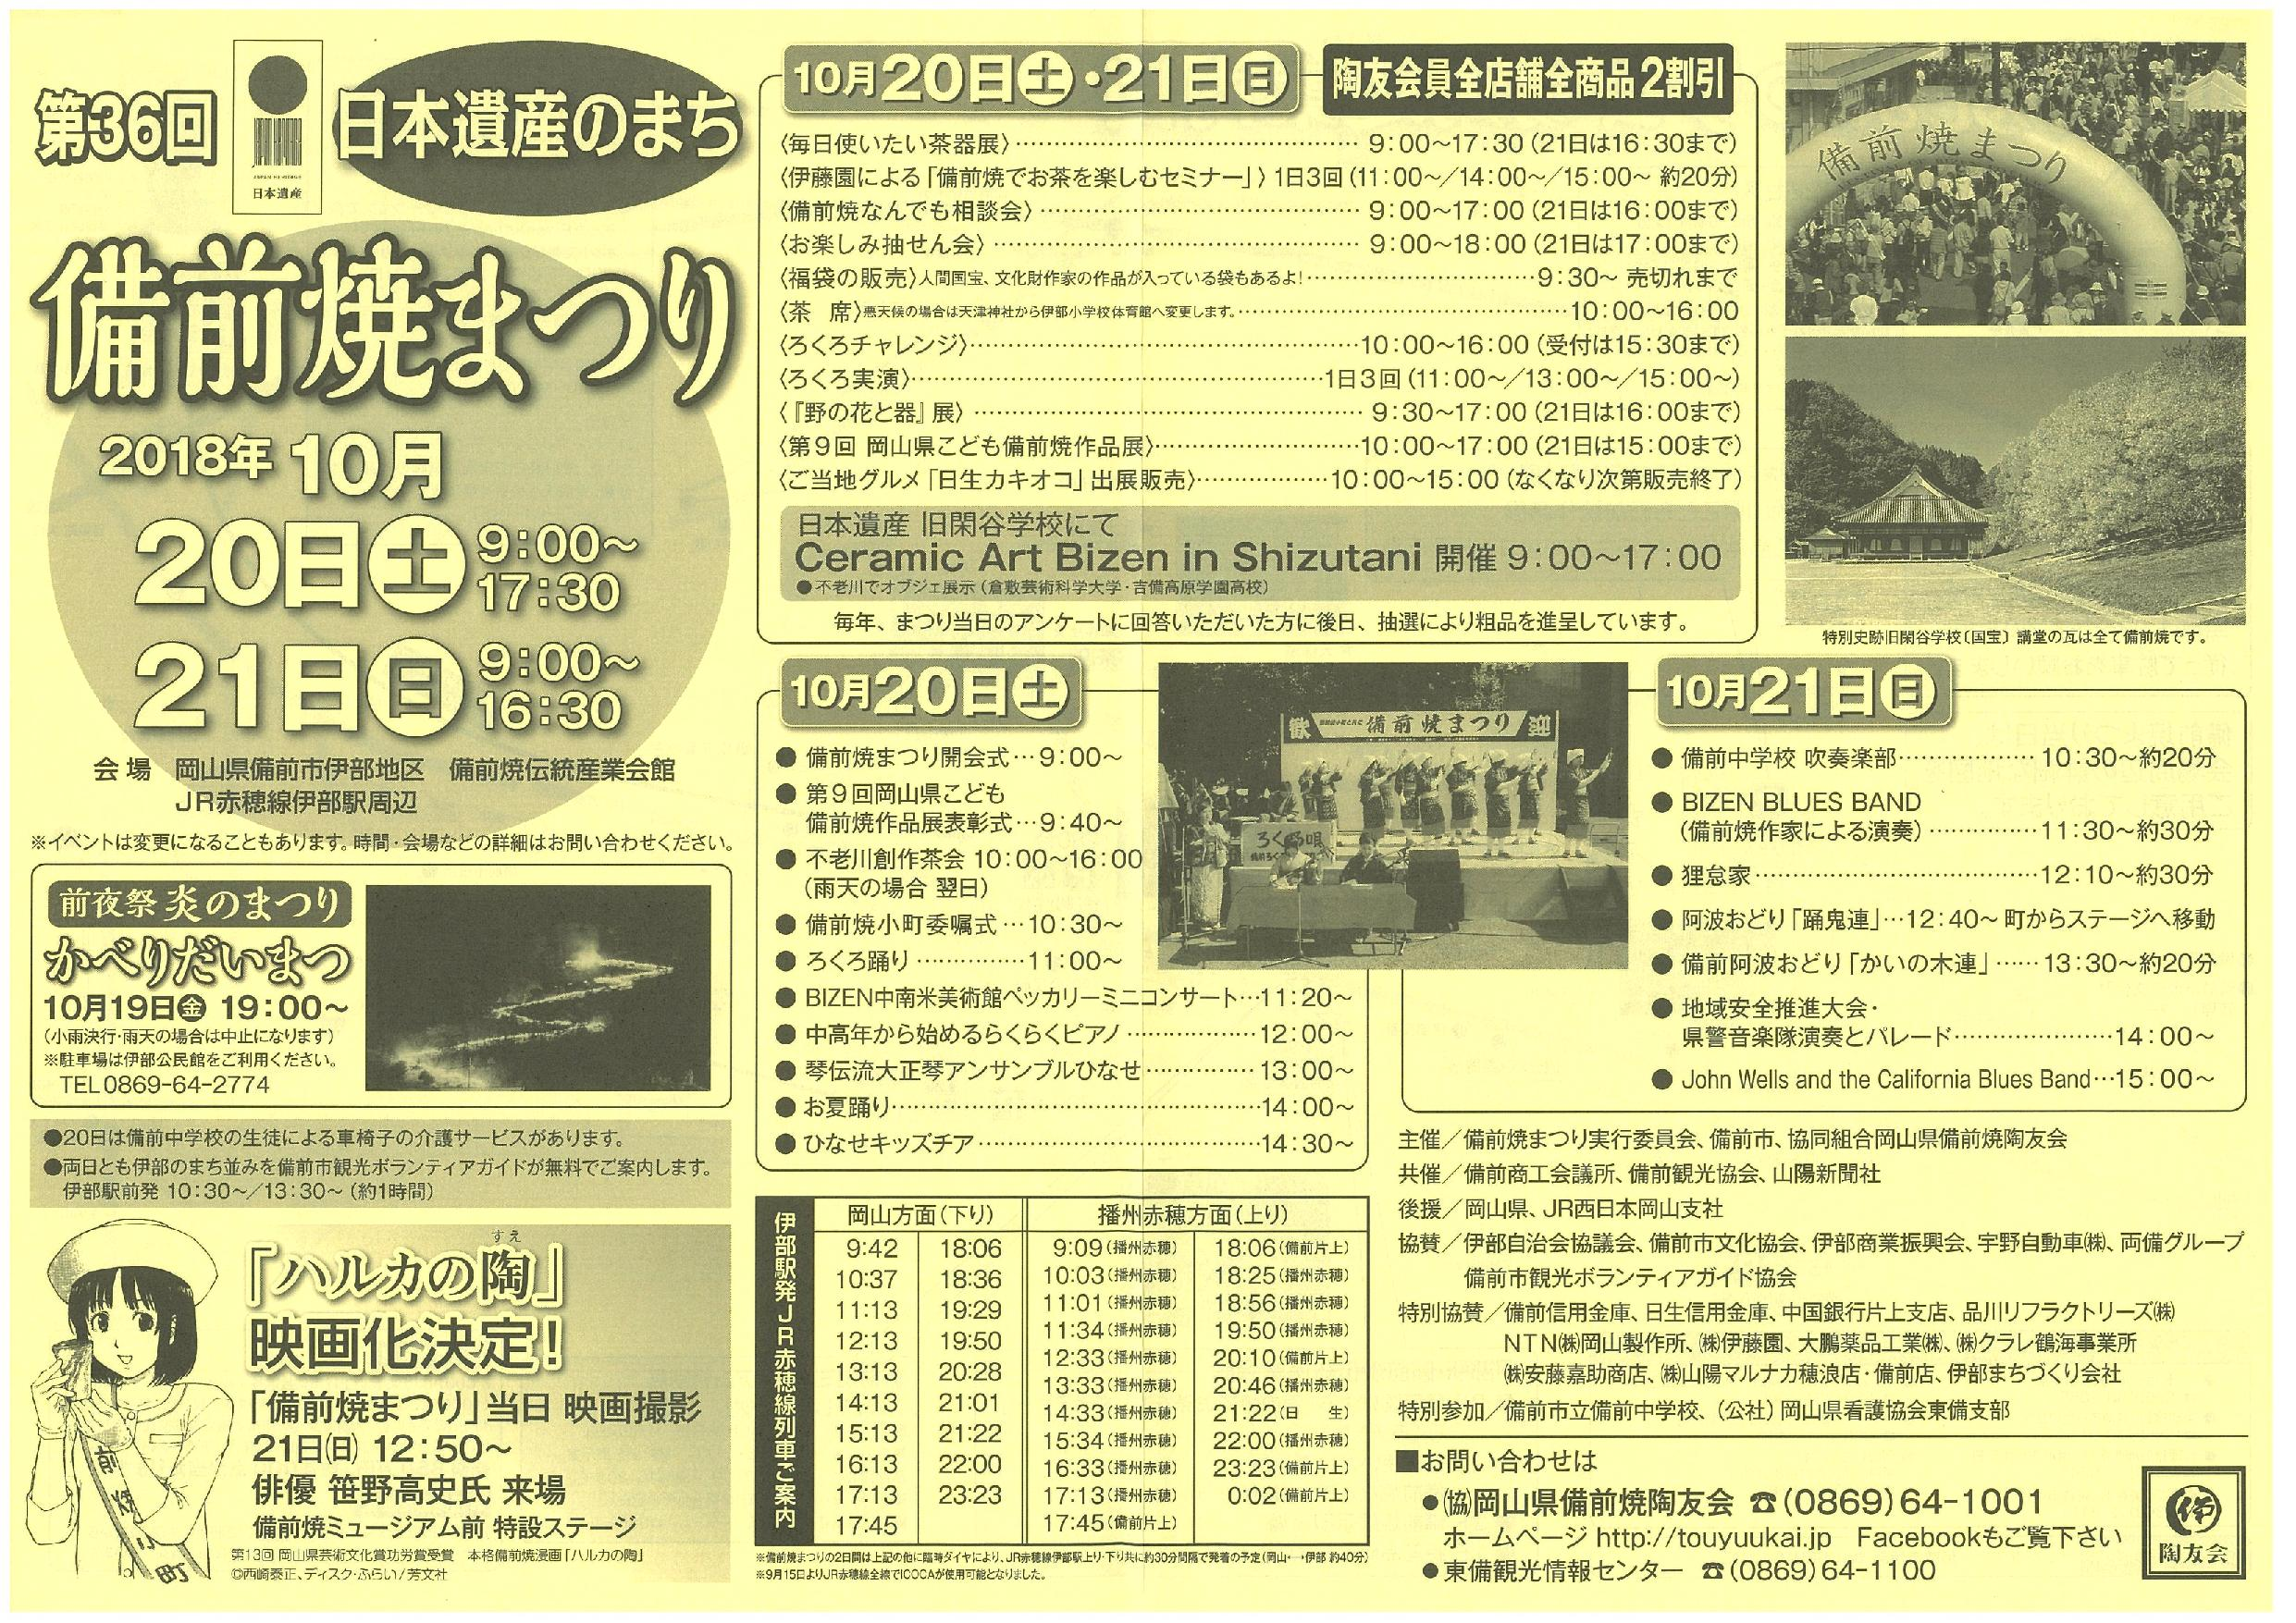 https://touyuukai.jp/wp/wp-content/uploads/2018/08/20180827114153-page-001.jpg